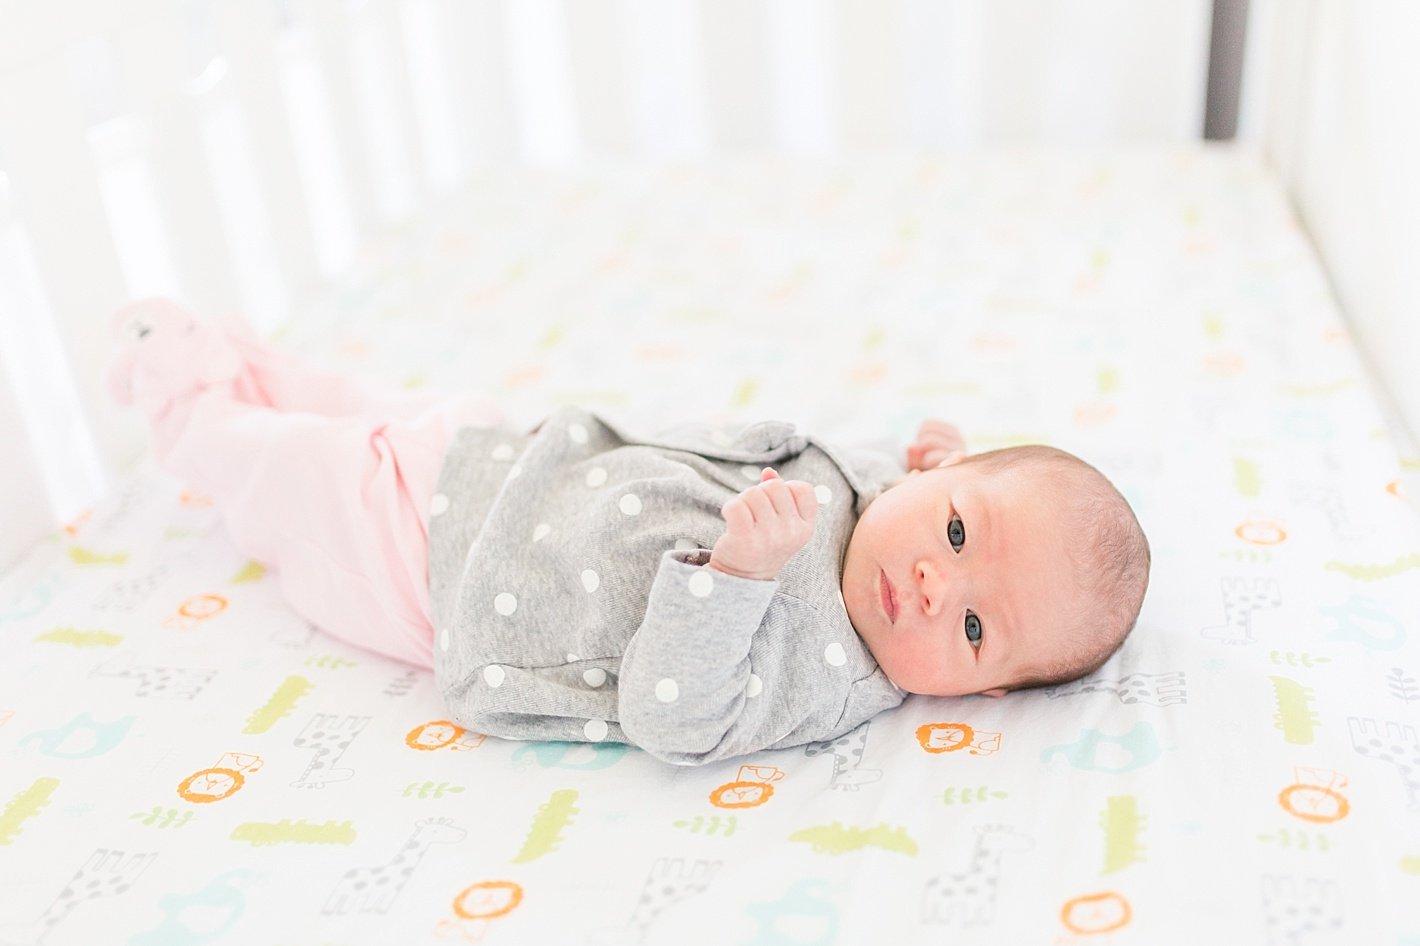 newborn_lifestyle_photographer_arpasi_photography_family_photographer_baltimore_photographer_0021